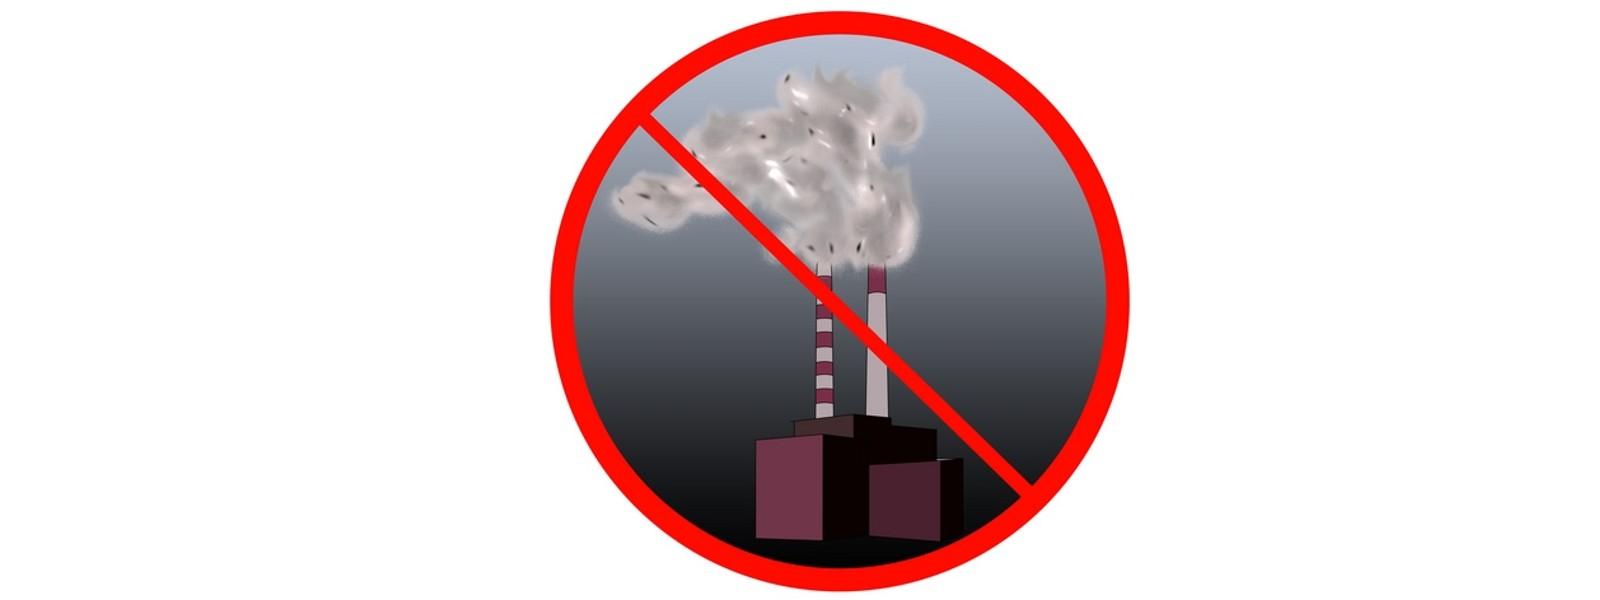 Sri Lanka pledges to stop building new coal power plants